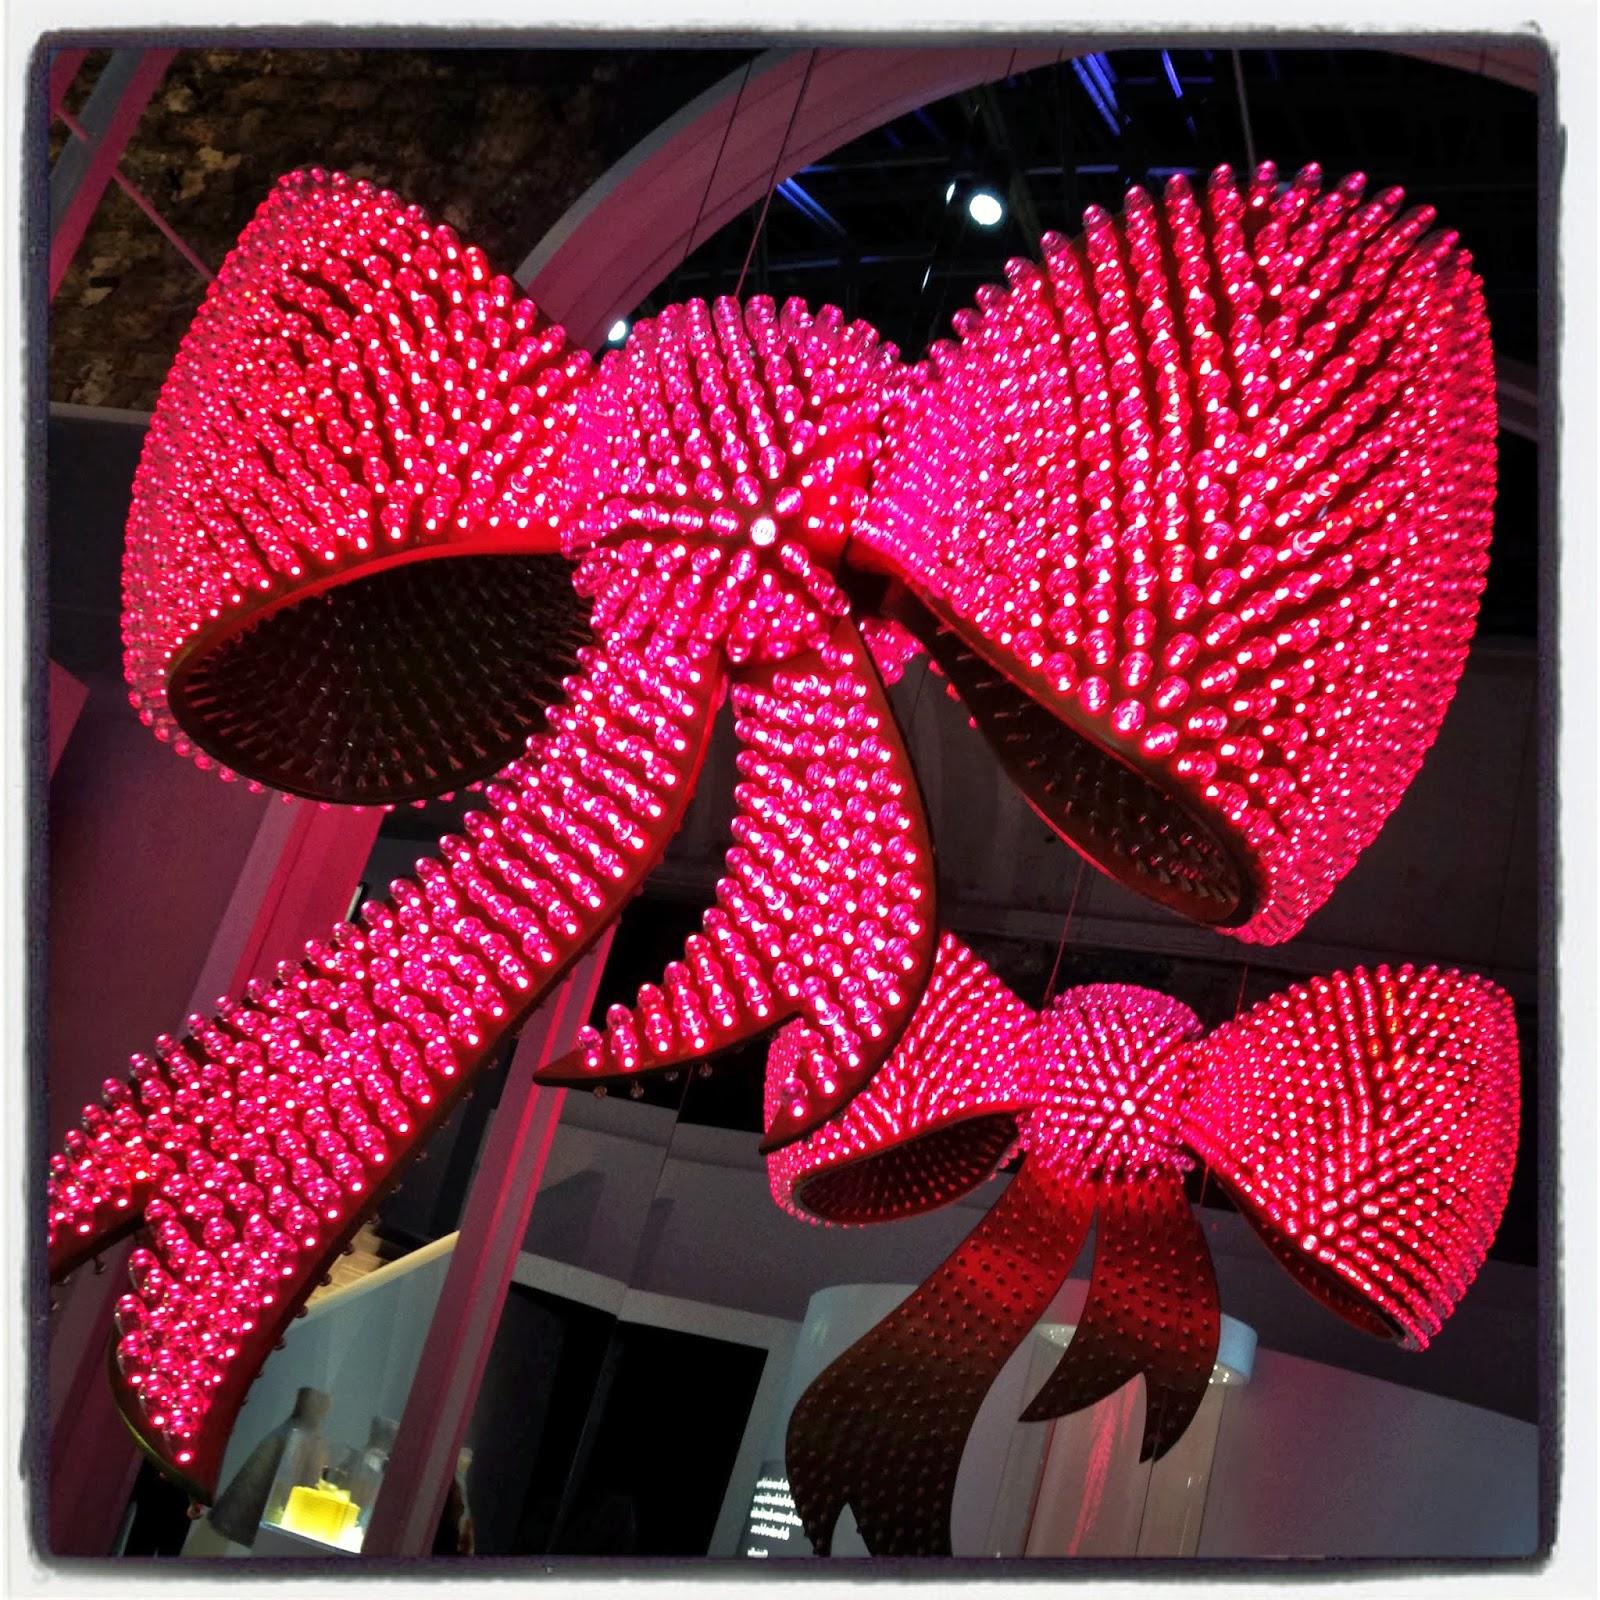 Les Garçons aux Foulards - Exposition Miss Dior - Joana Vasconcelos 2013 50eaca02f31